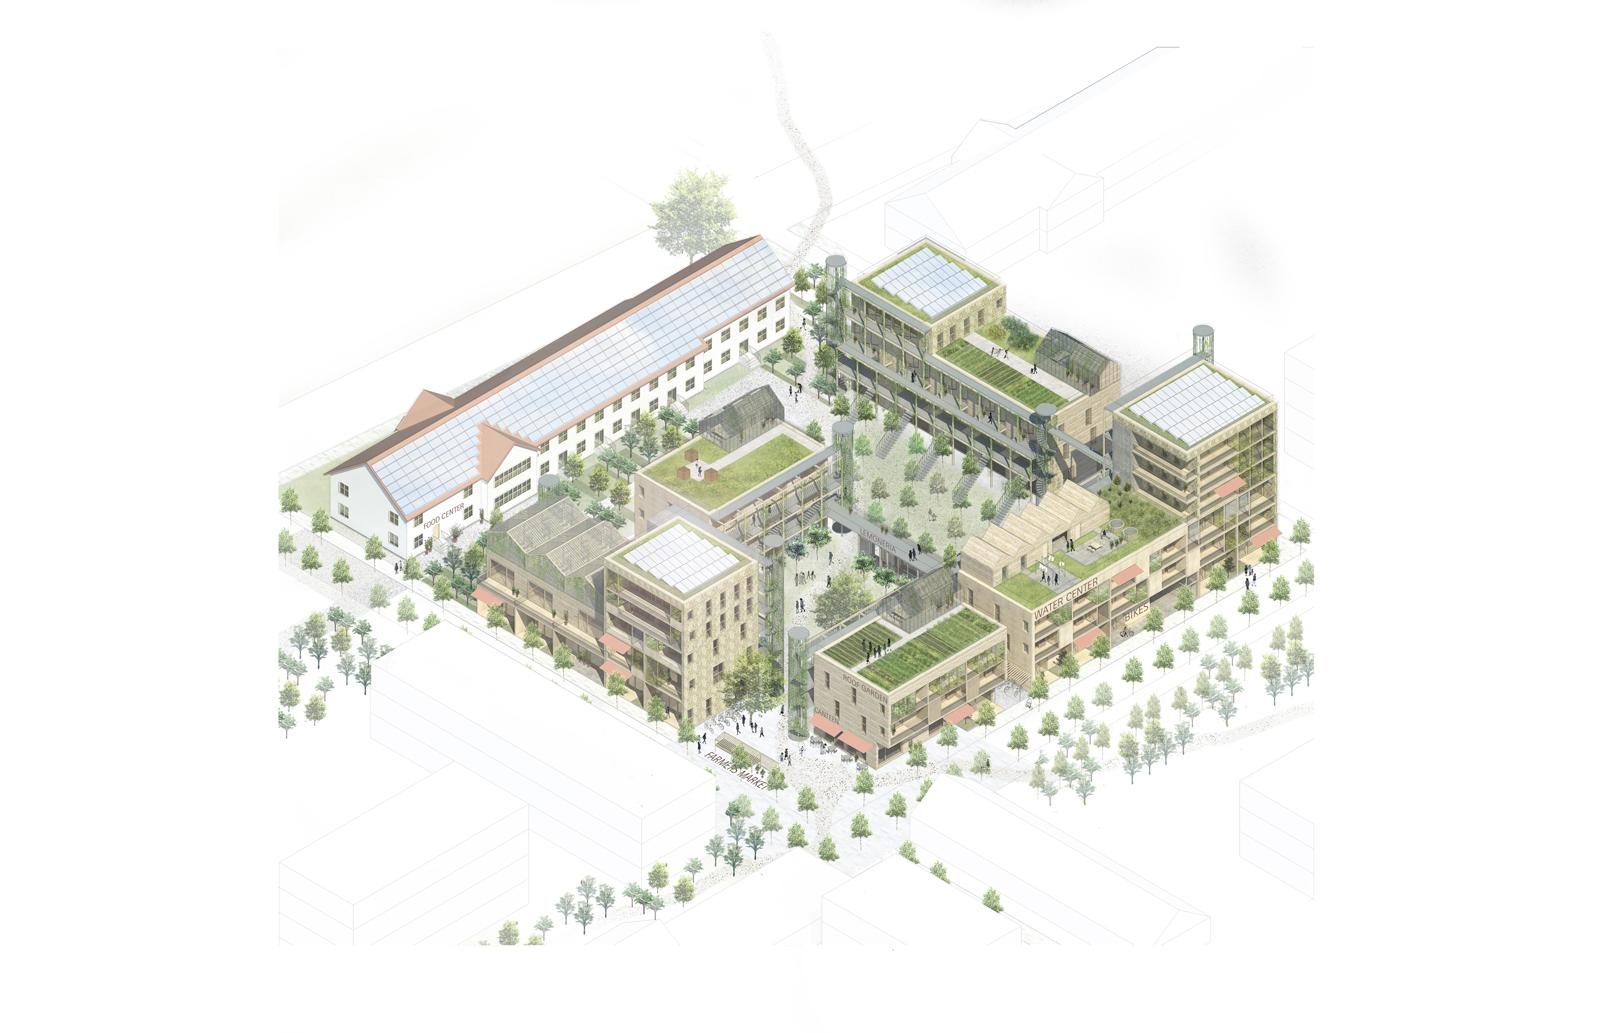 Kjellander sj berg 39 s winning design provides sustainable - Sustainable urban planning and design ...